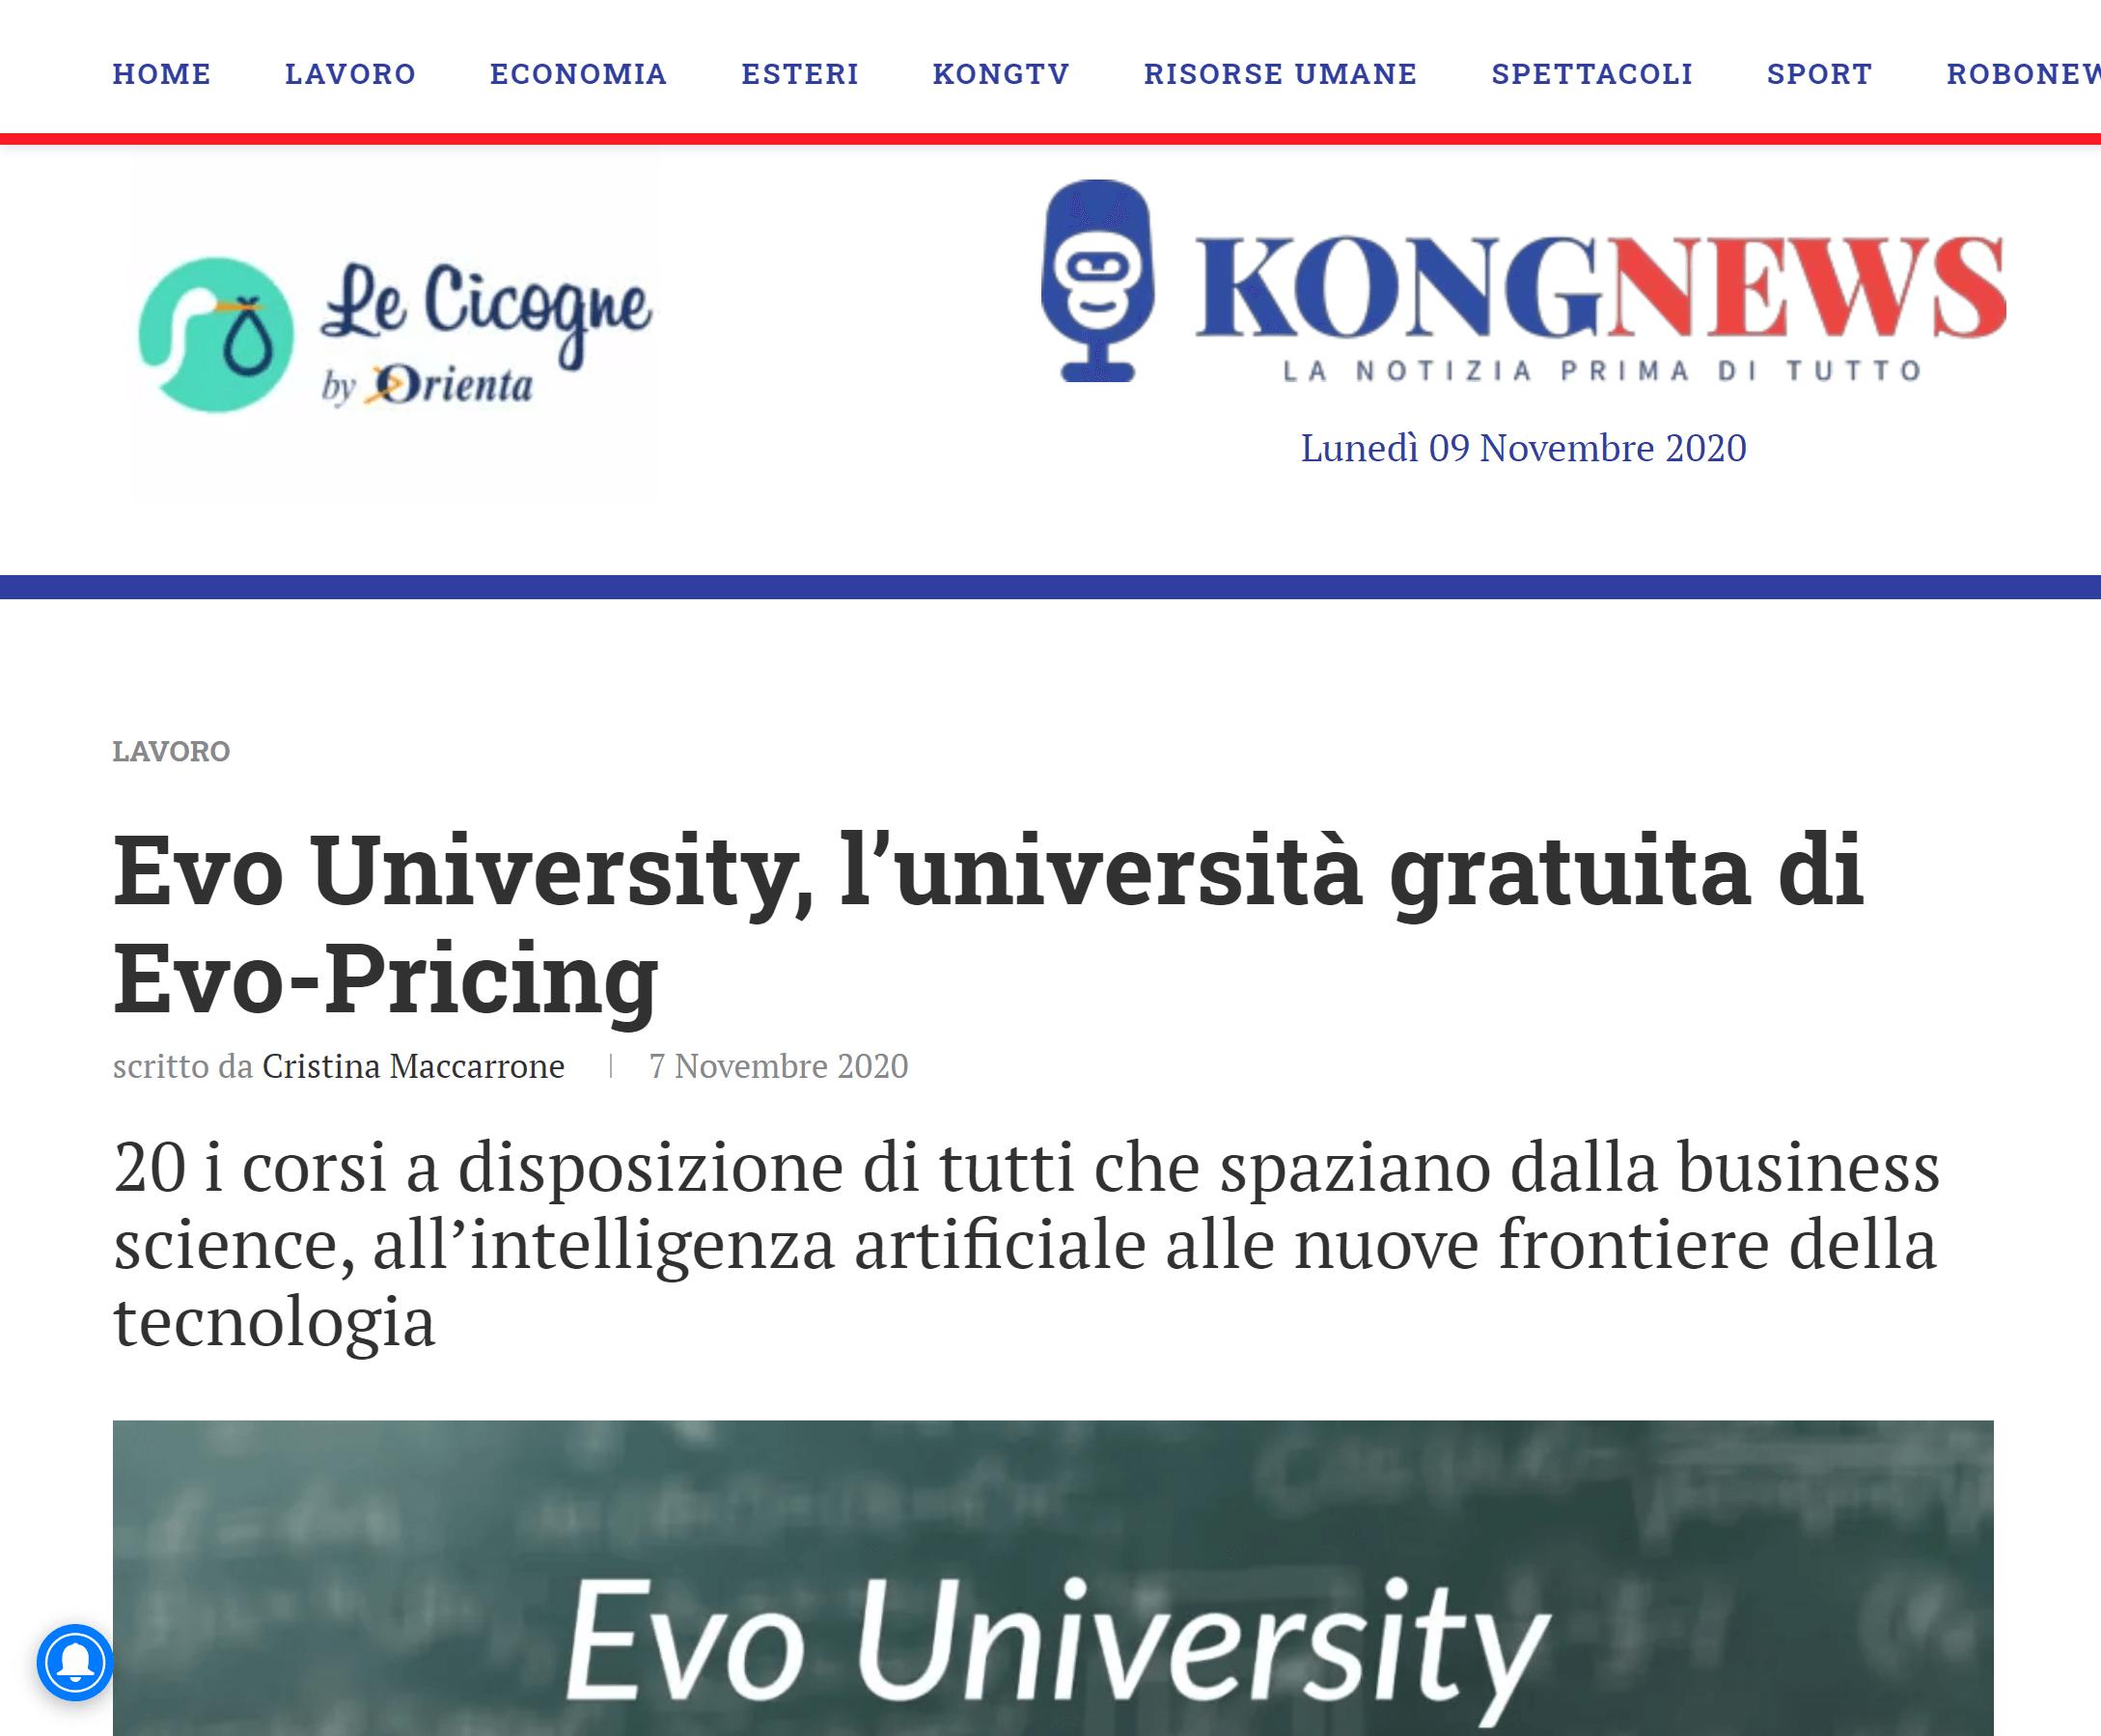 KongNews